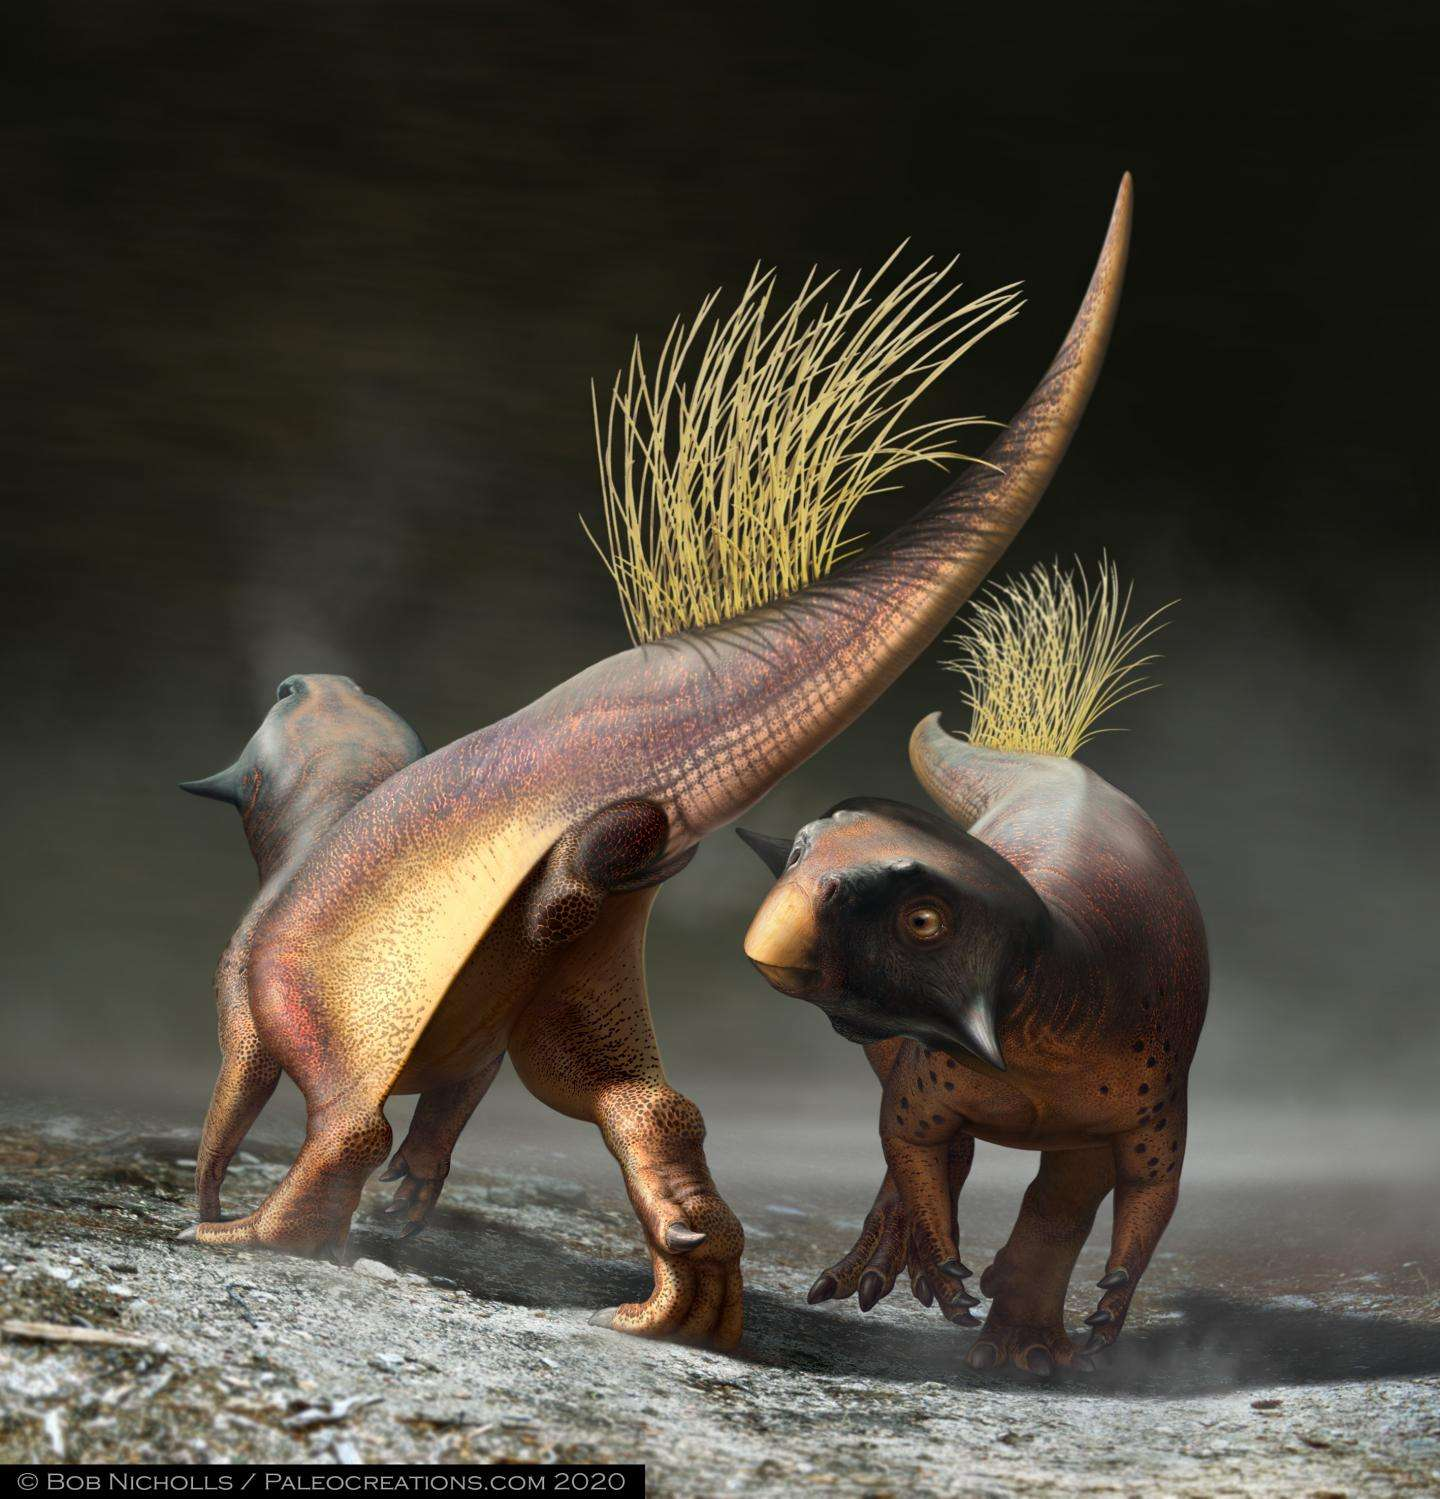 Le paléoartiste Robert Nicholls a reconstruit Psittacosaurus, en illustrant l'une des utilisations possibles du cloaque du dinosaure : la signalisation durant la parade nuptiale. © Bob Nicholls, Paleocreations.com 2020